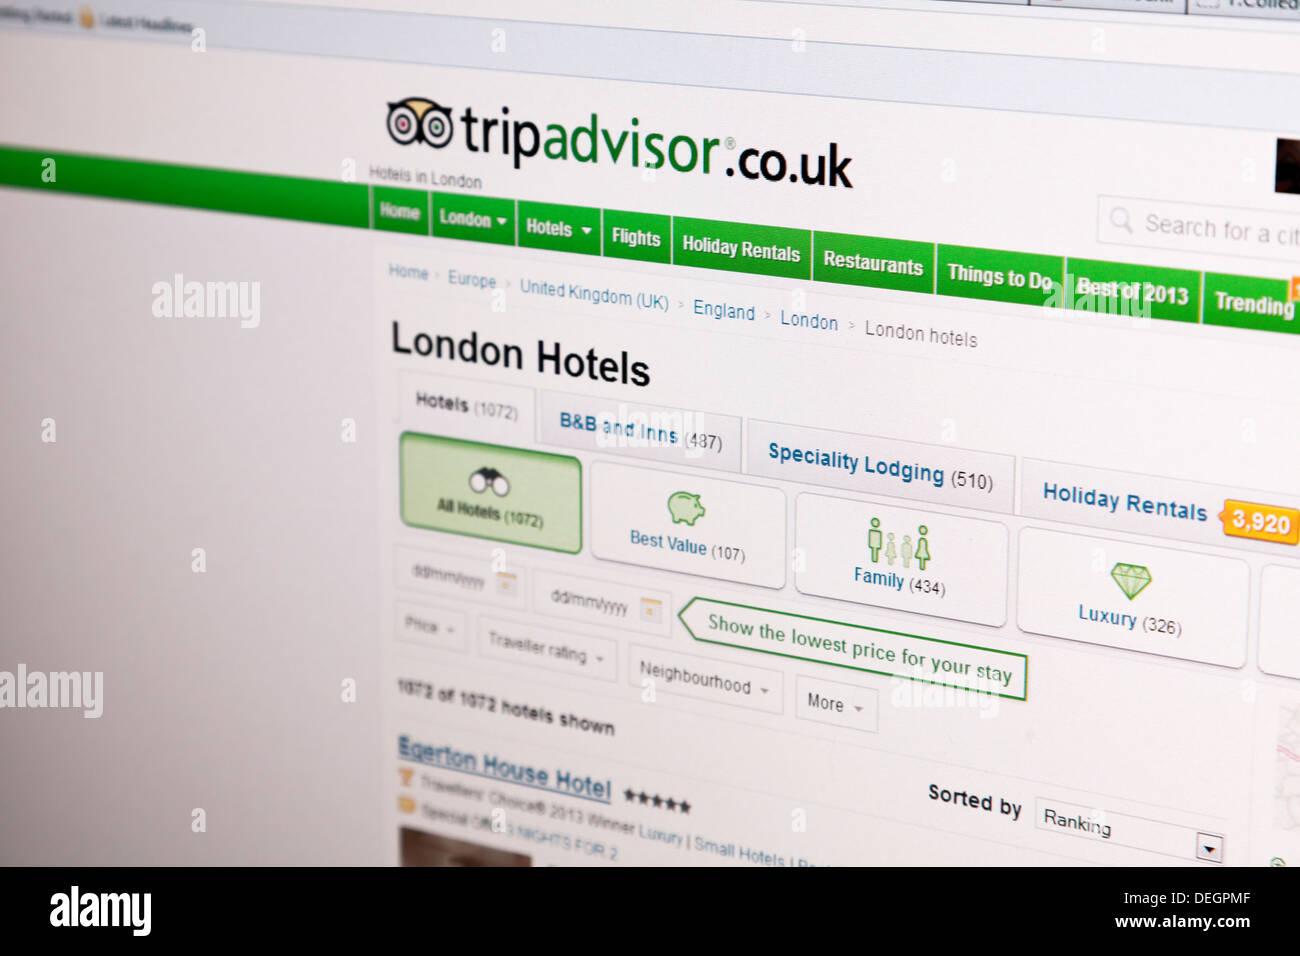 Tripadvisor trip advisor sito internet versione UK tripadvisor.co.uk Immagini Stock